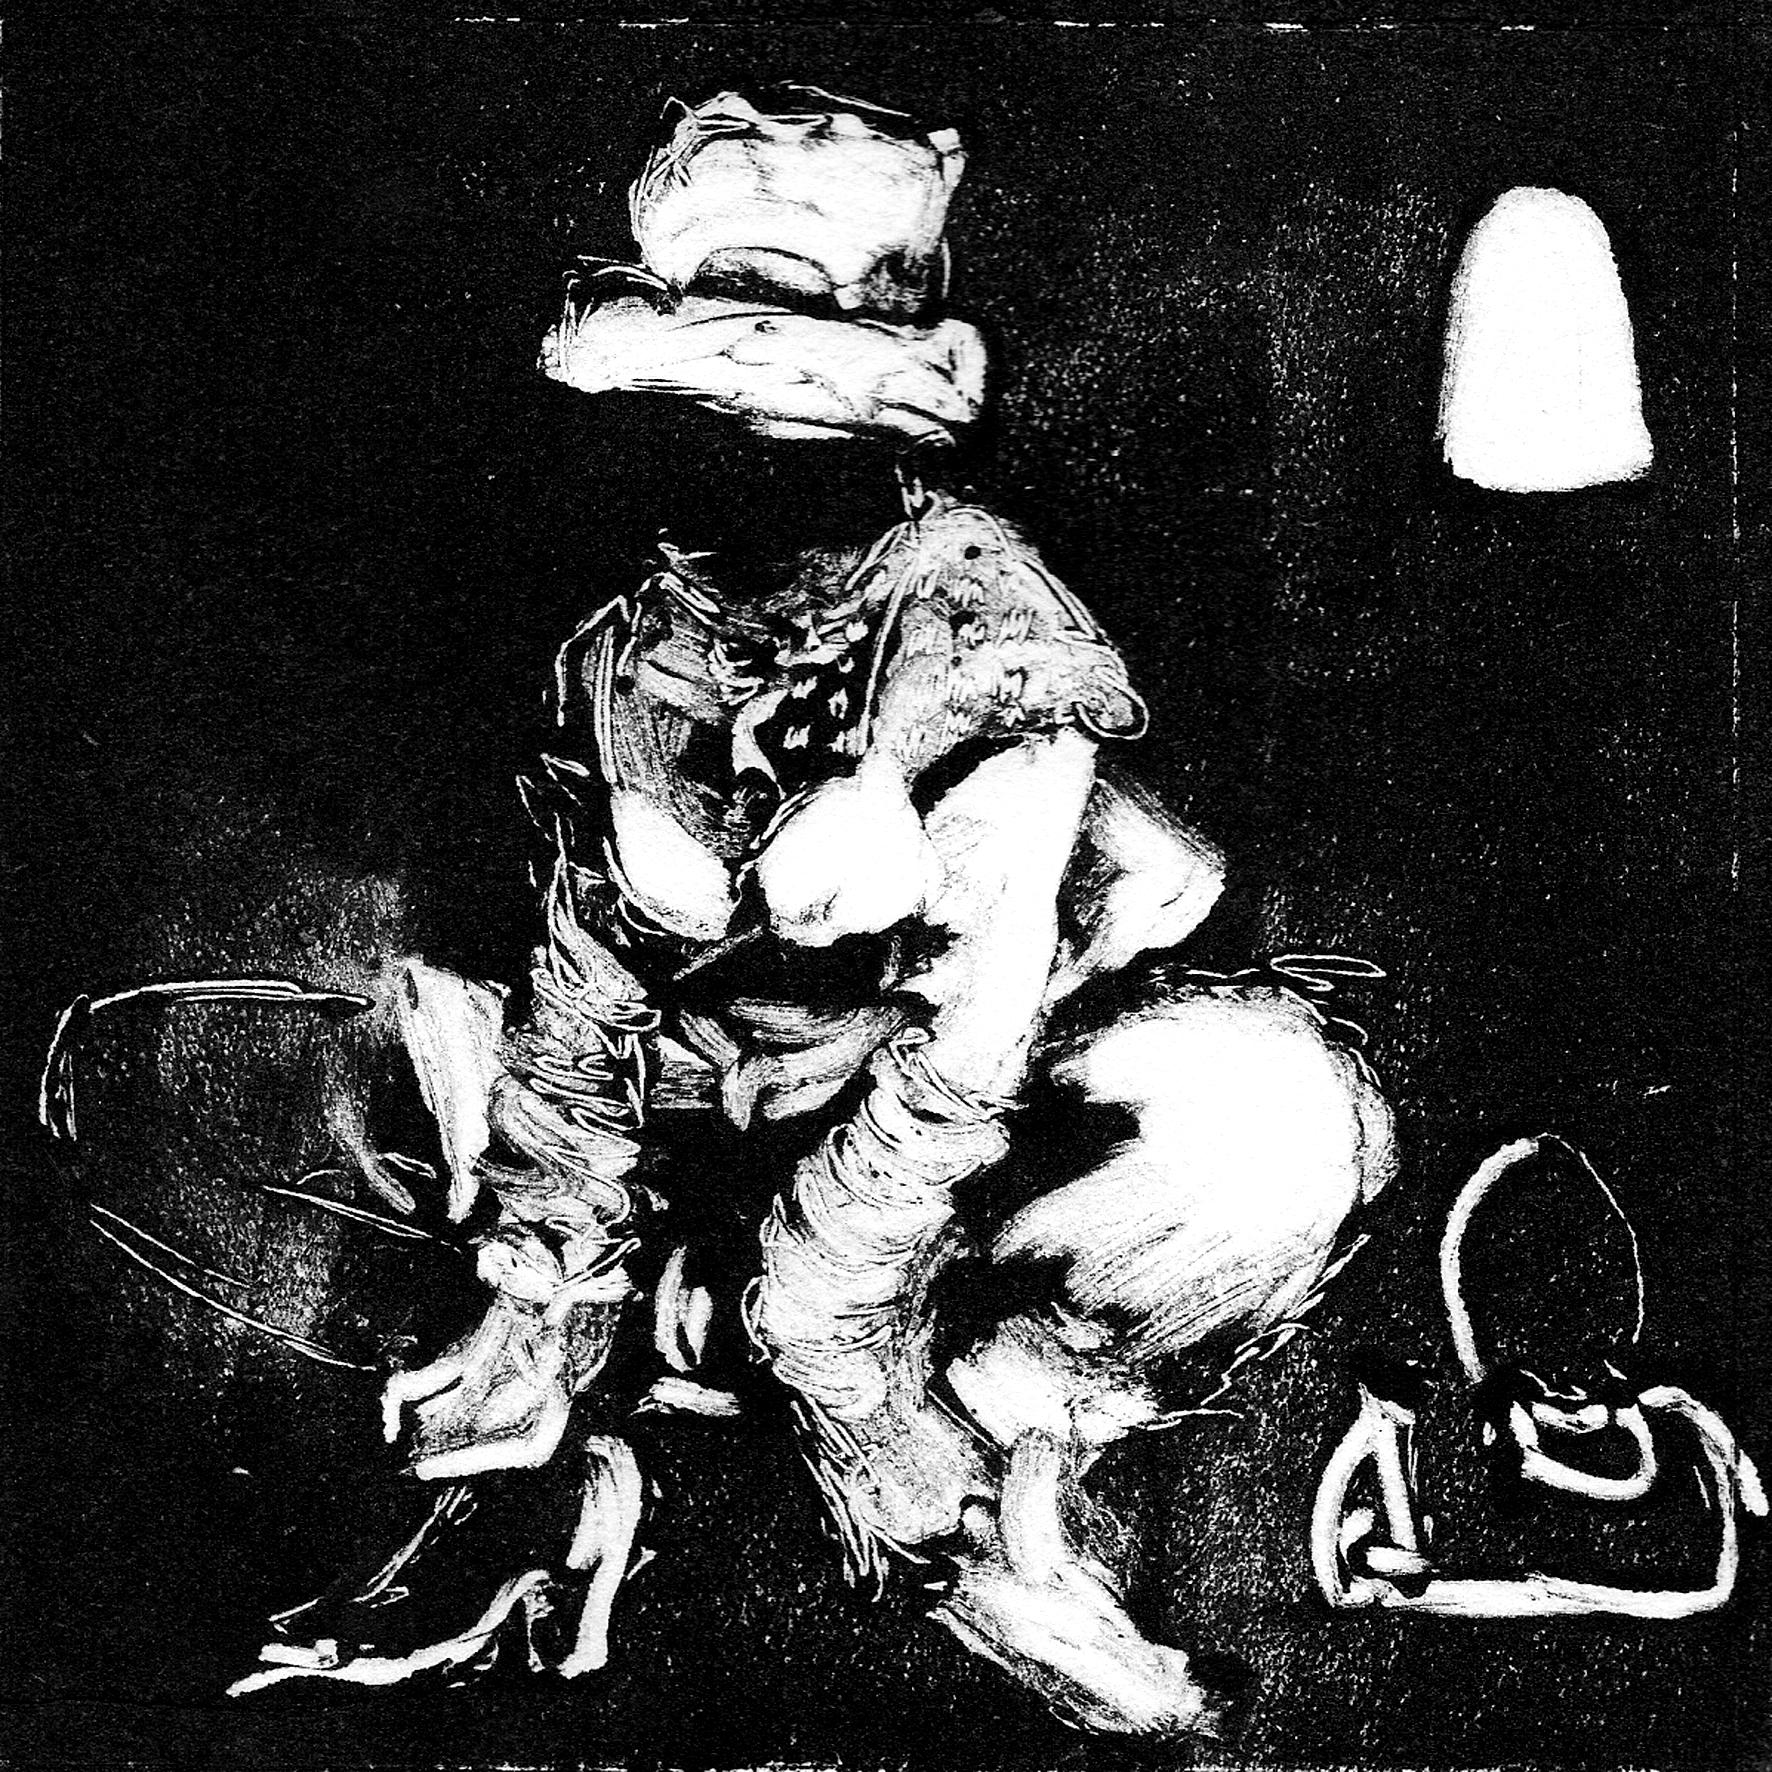 Feminine2010, monotype on japanese paper, 15x15 cm